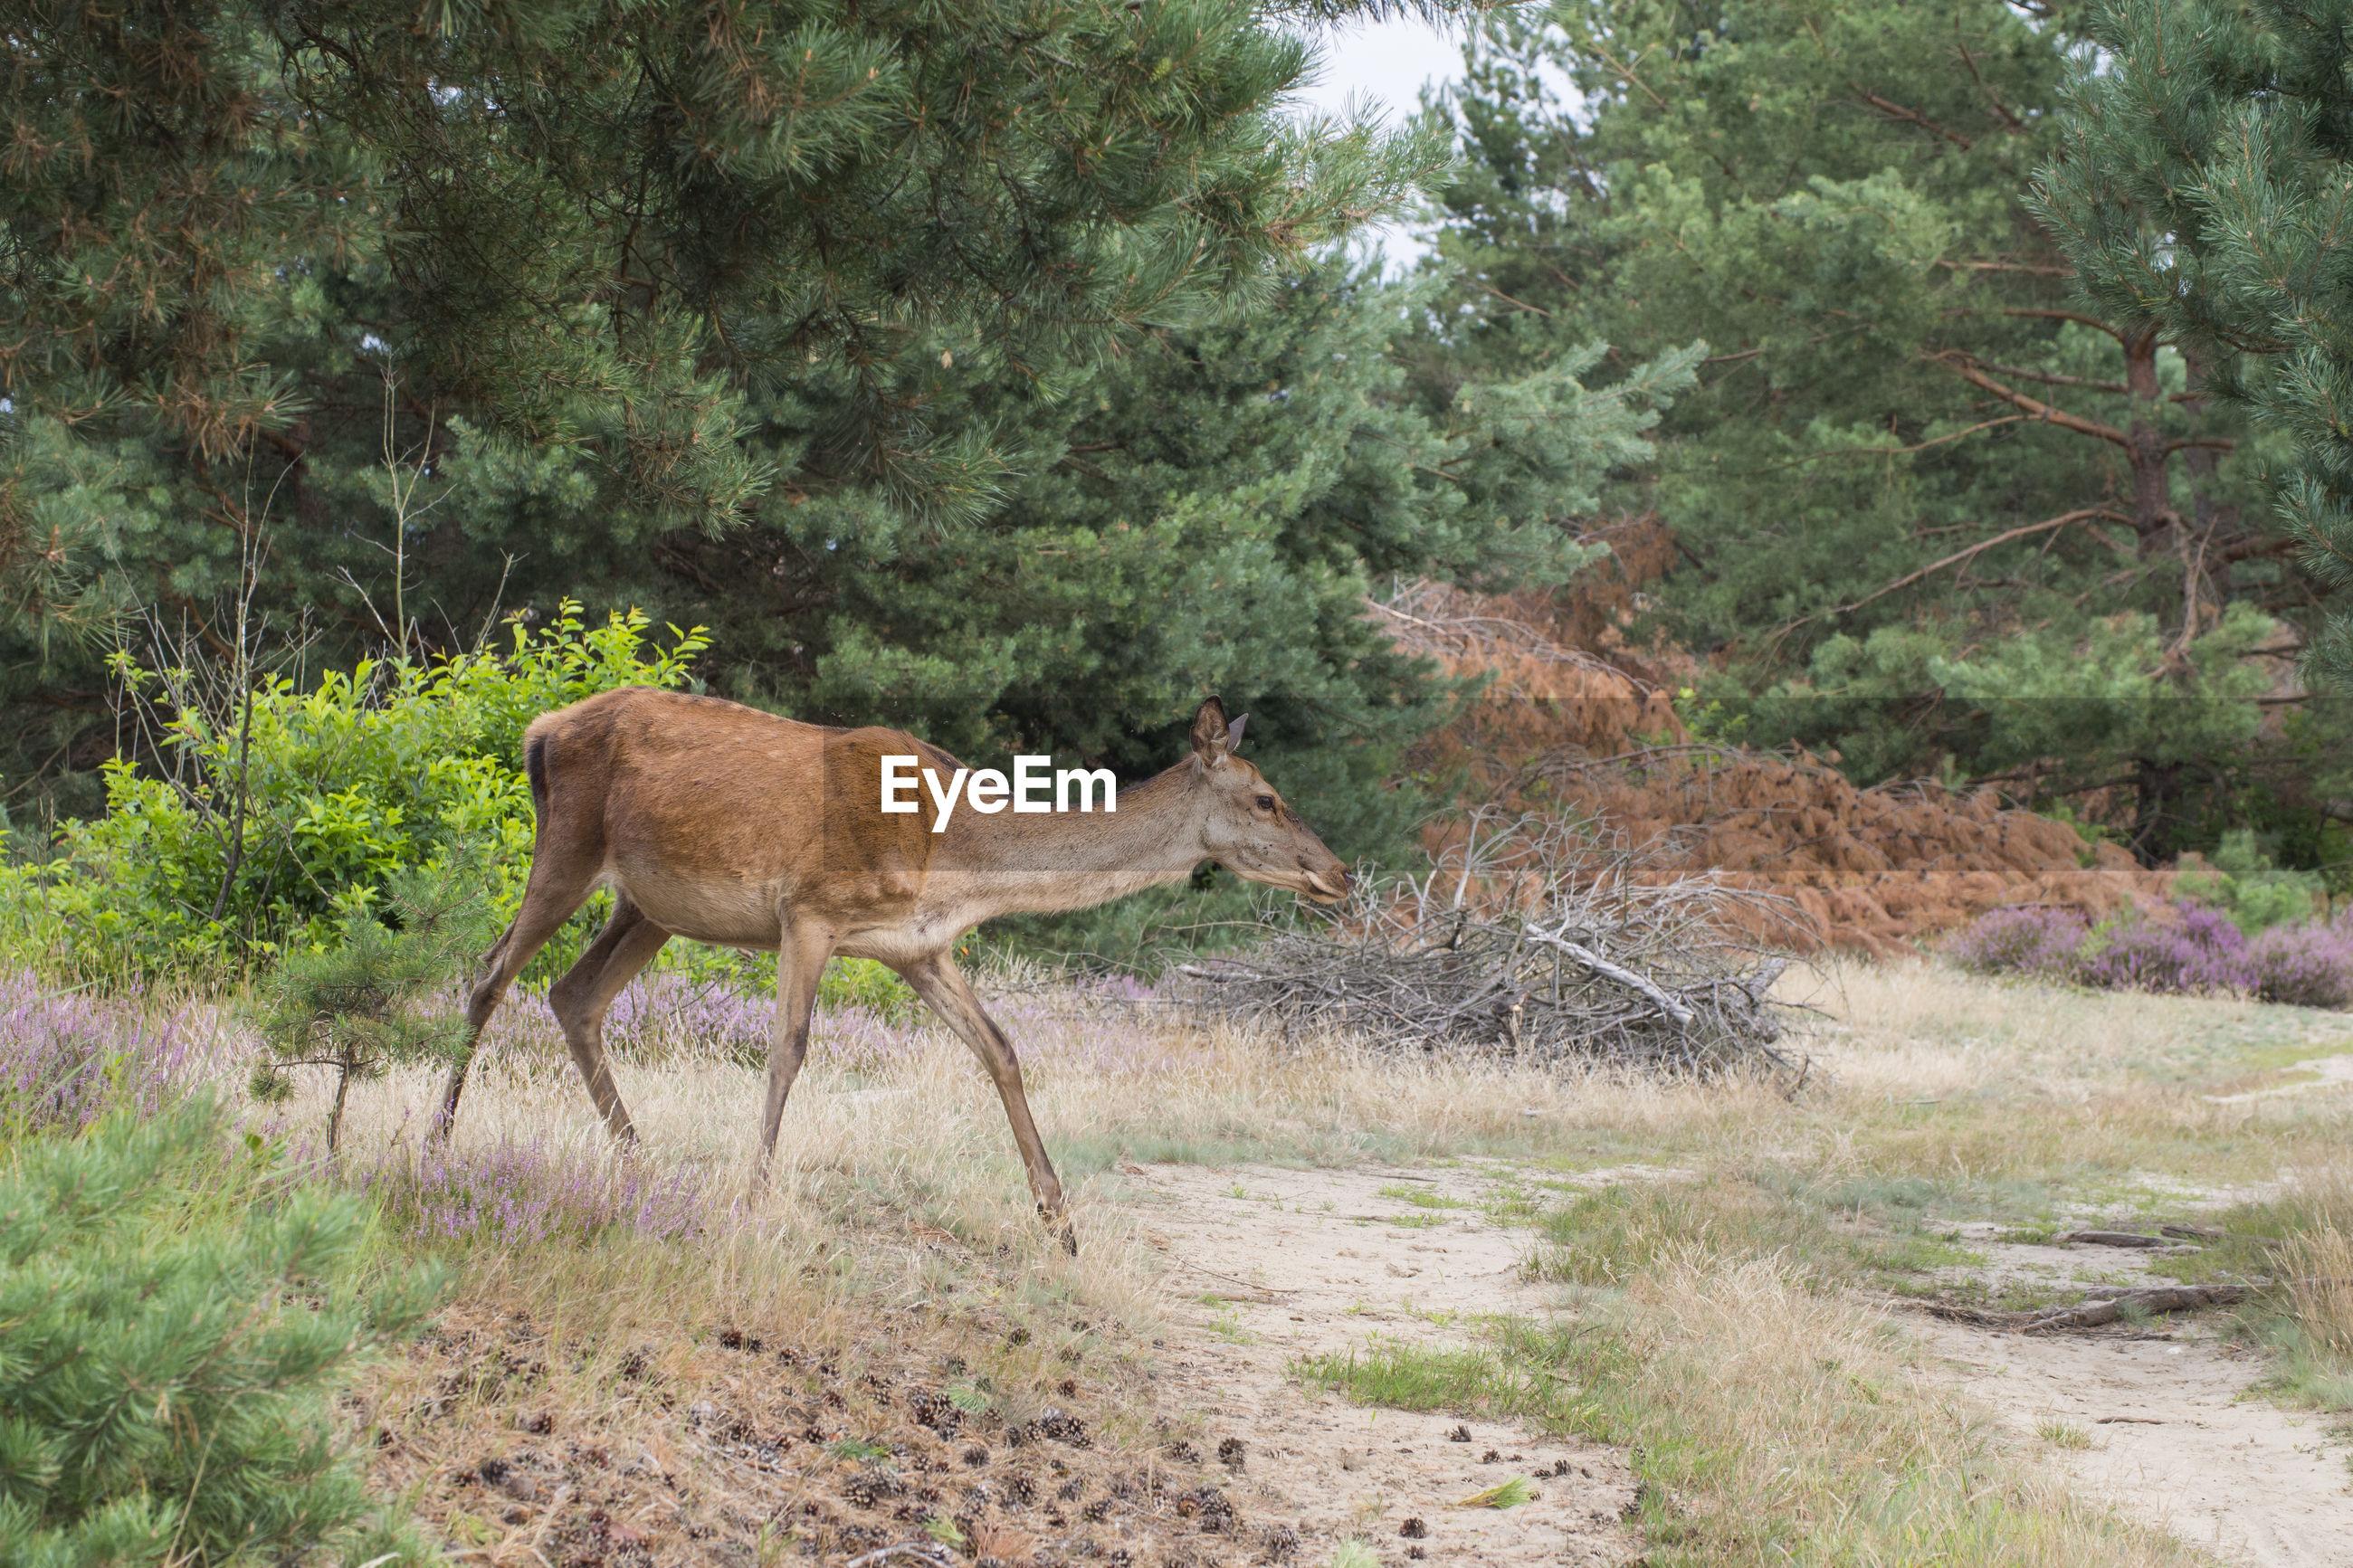 SQUIRREL IN FOREST